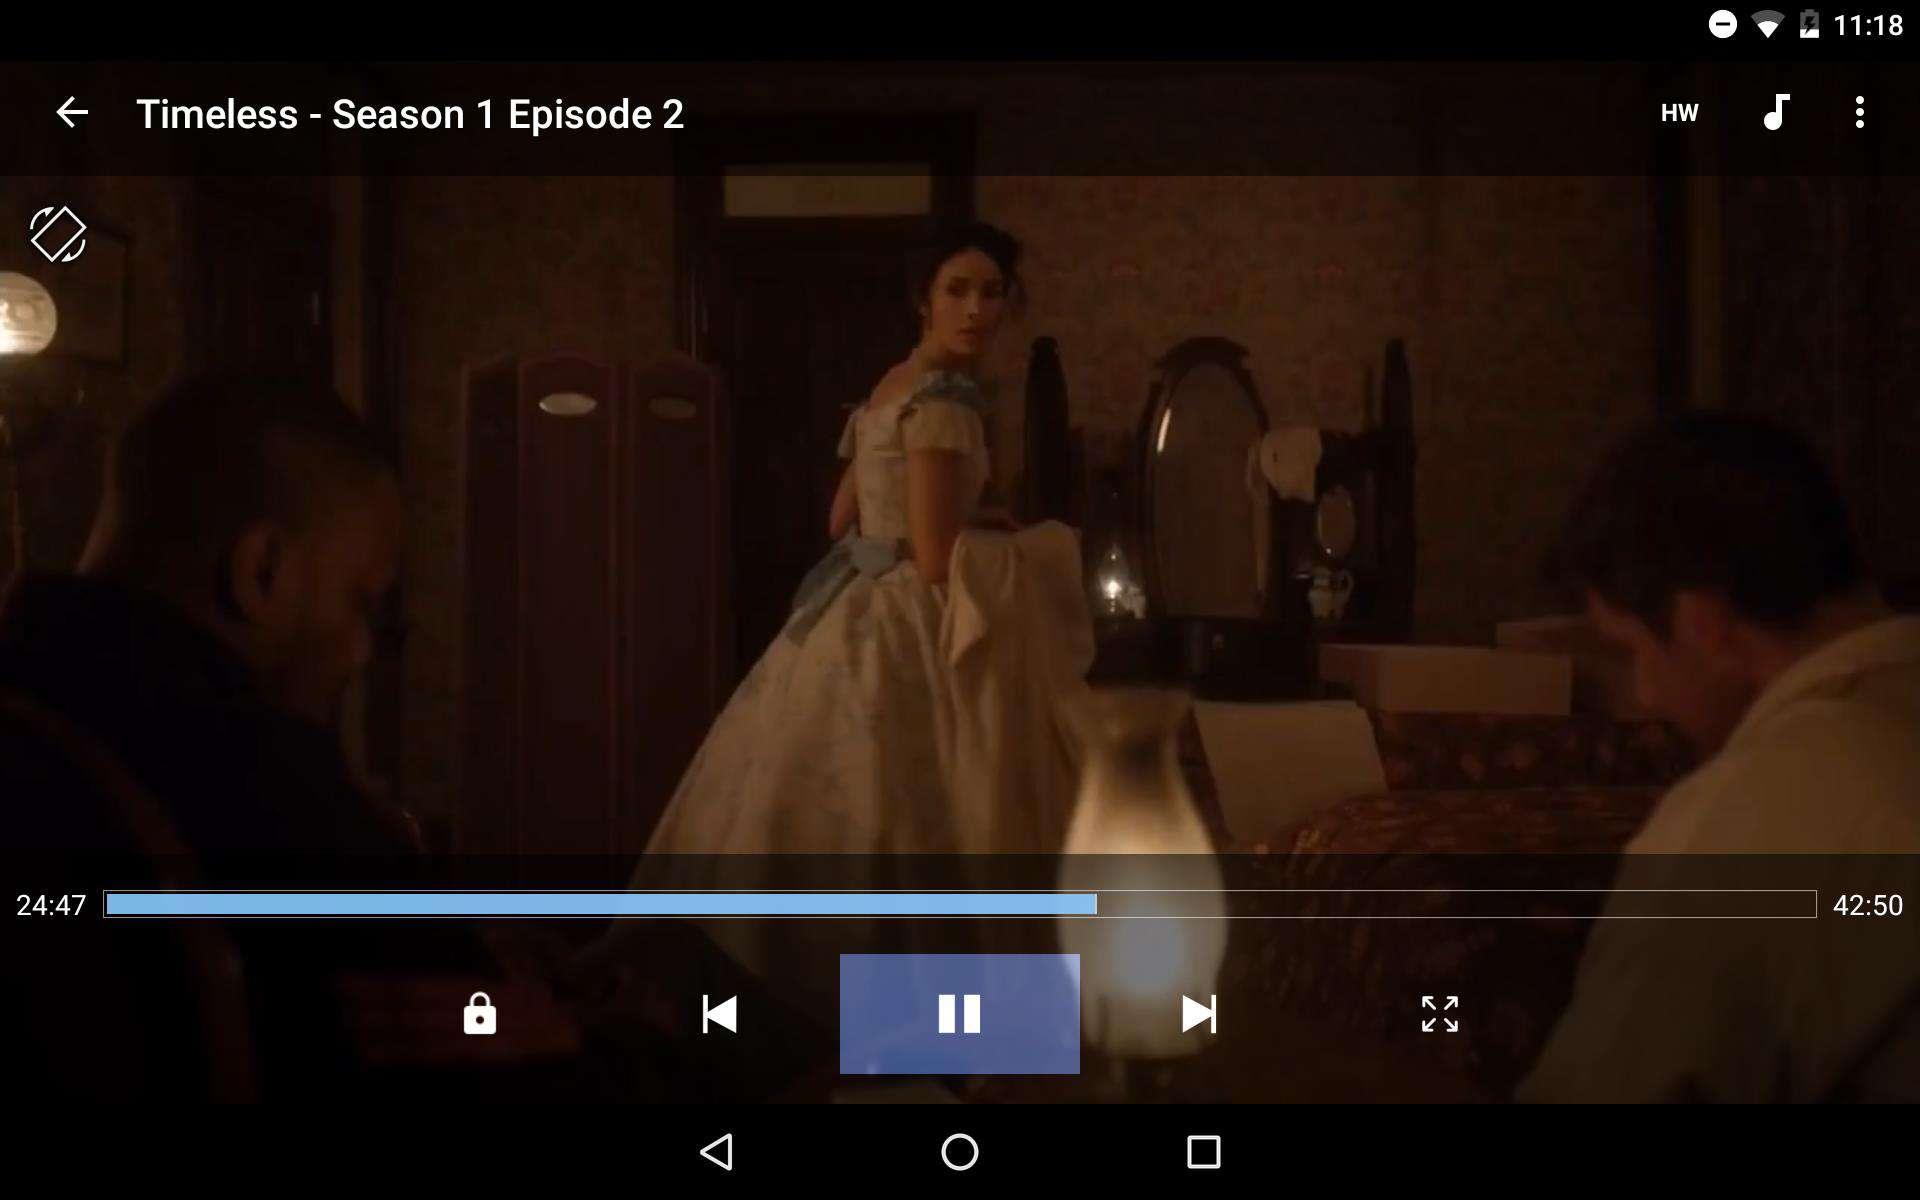 Terrarium TV Android App: a better way to stream media